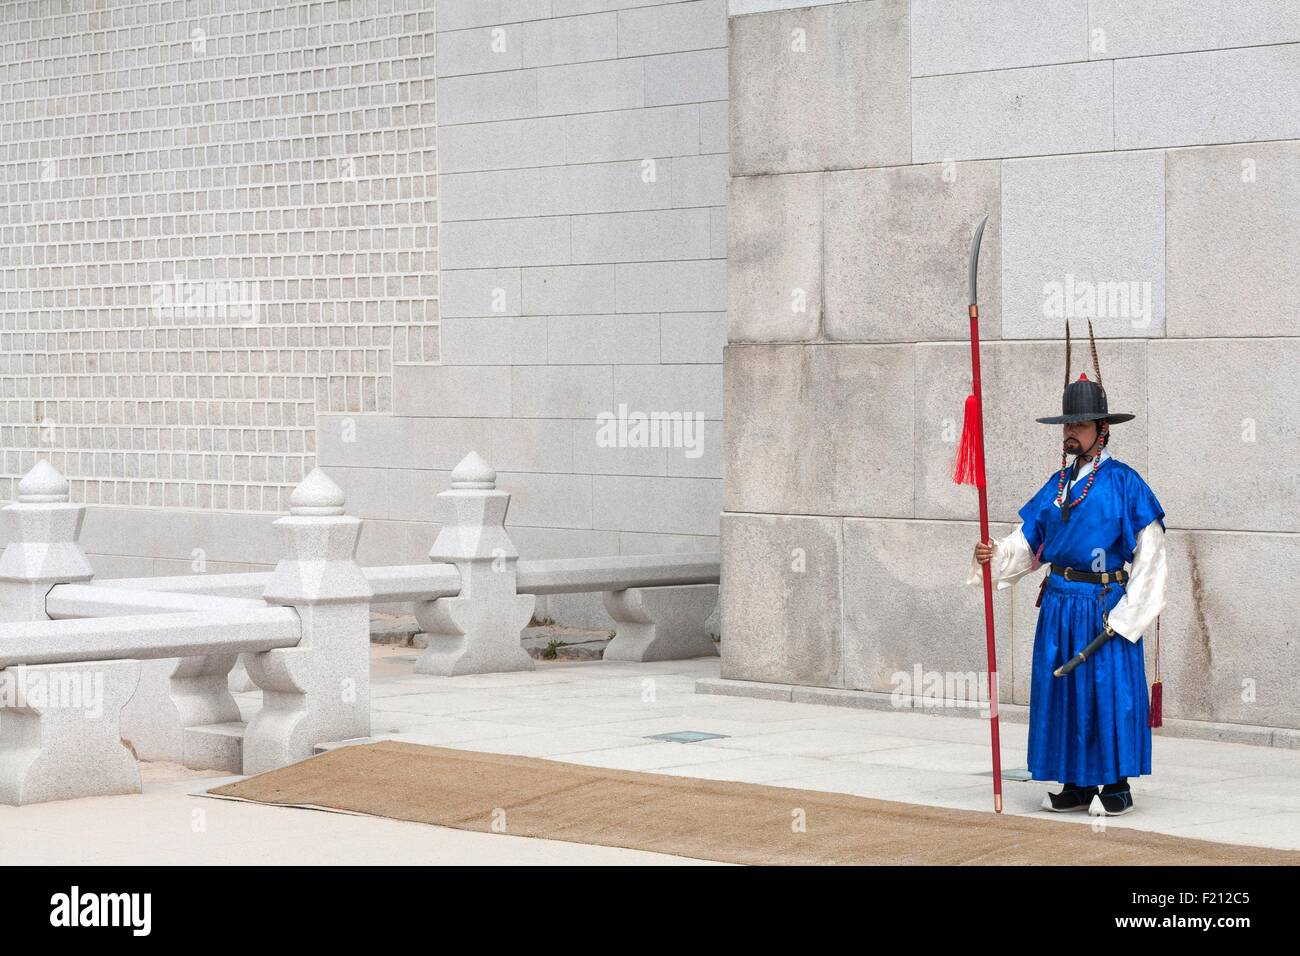 Südkorea, Seoul, Jongno-gu, Gwanghwamun-Tor Gwanghwa Gyeongbokgung Königspalast, Baby-/Kinderbetreuung Stockbild